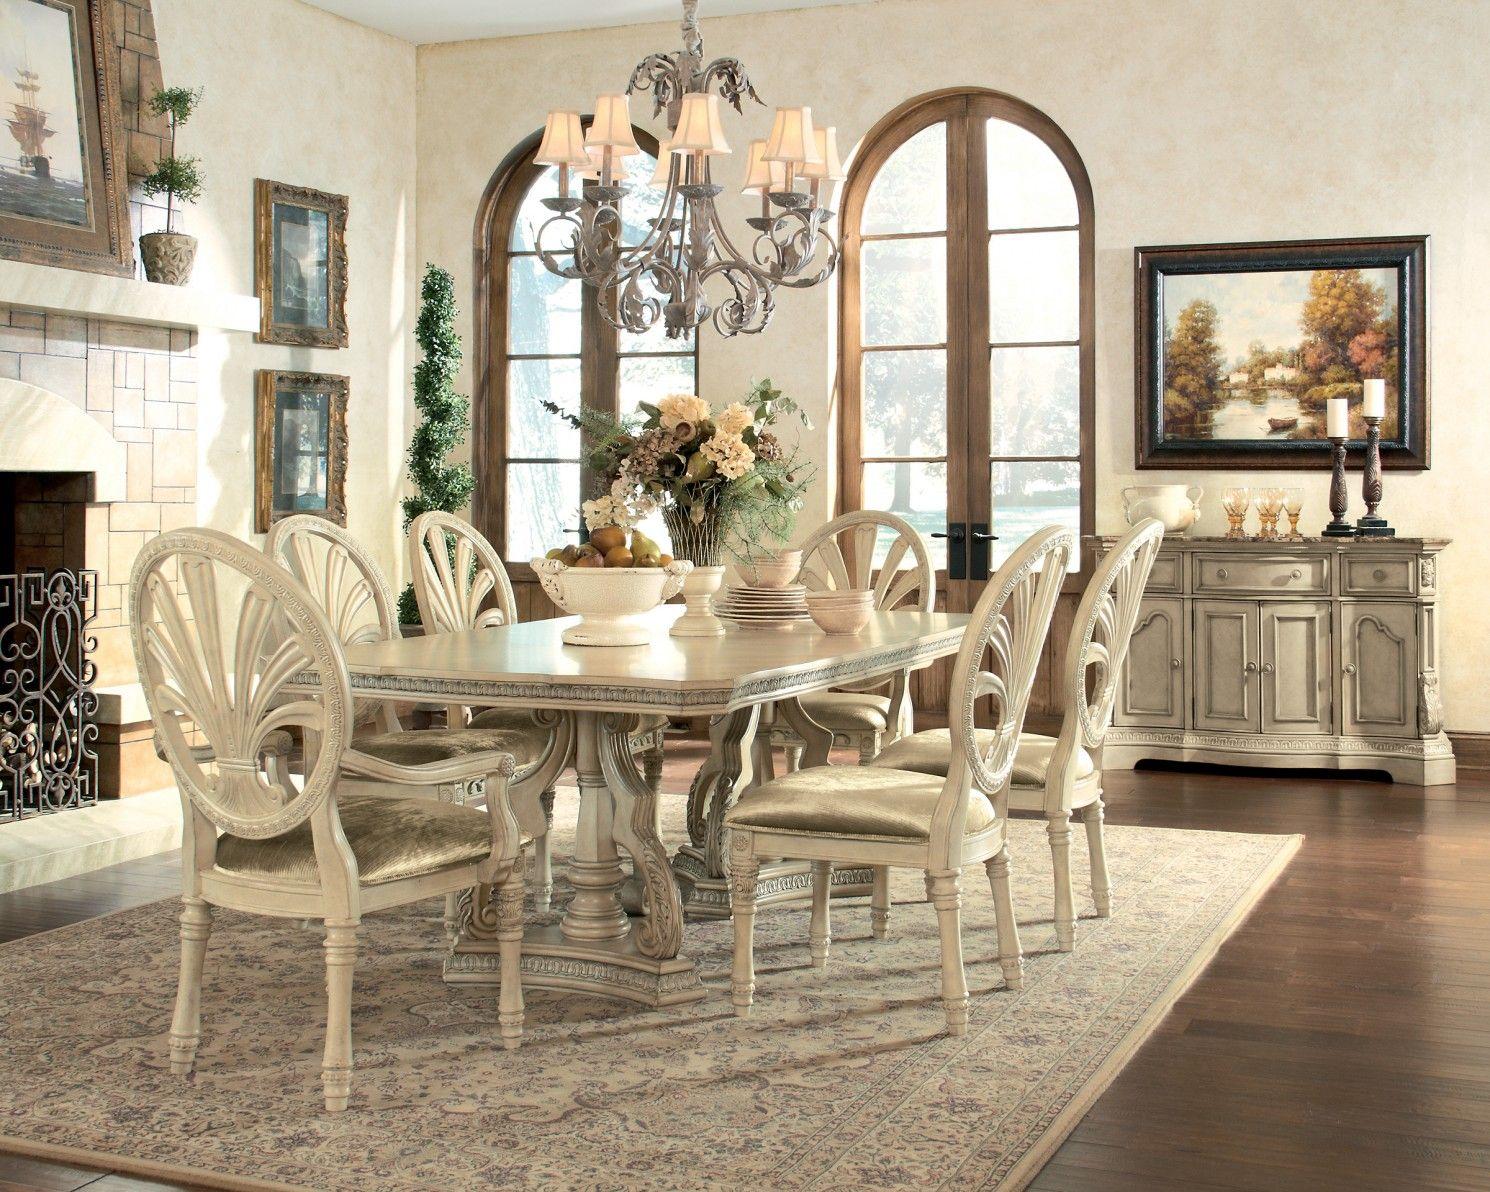 Ashley ortanique d707 60 millennium dining room server dining room setsdining tablepedestal